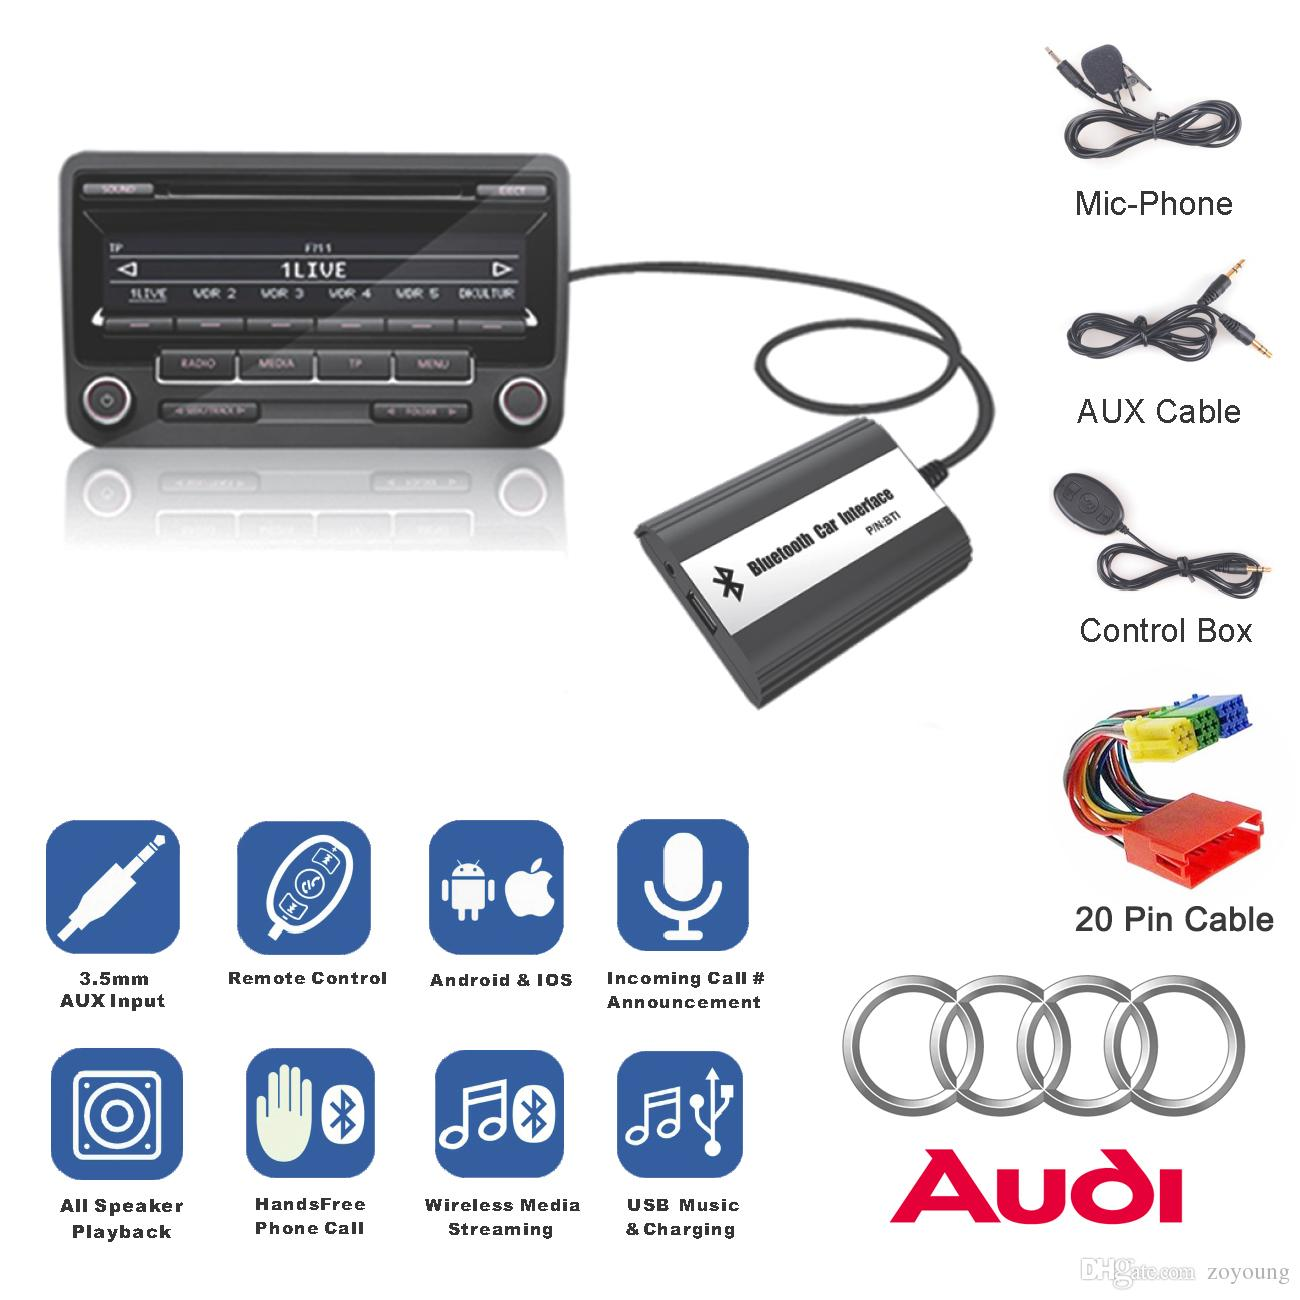 Bluetooth A2DP manos libres coche Kit USB Flash Drive coche adaptador estéreo interfaz para 1998-2006 Audi A2 A3 A4 A6 A8 TT AllRoad